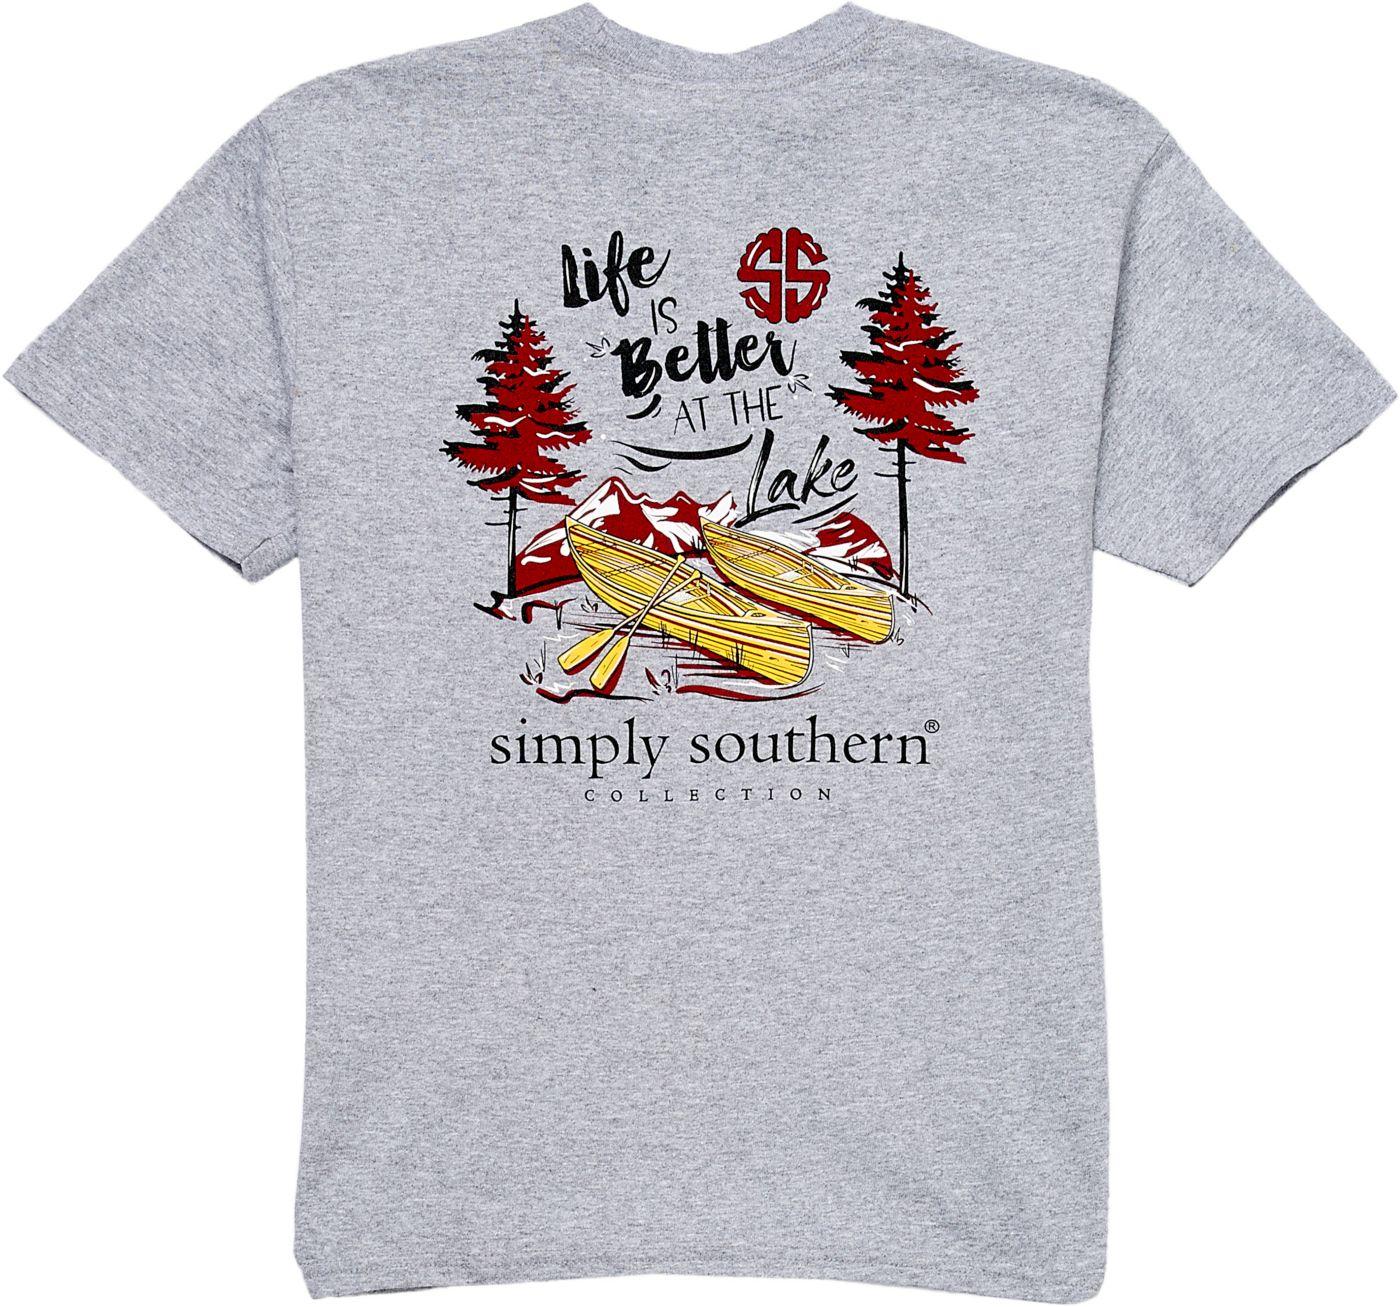 Simply Southern Girls' Lake Short Sleeve T-Shirt